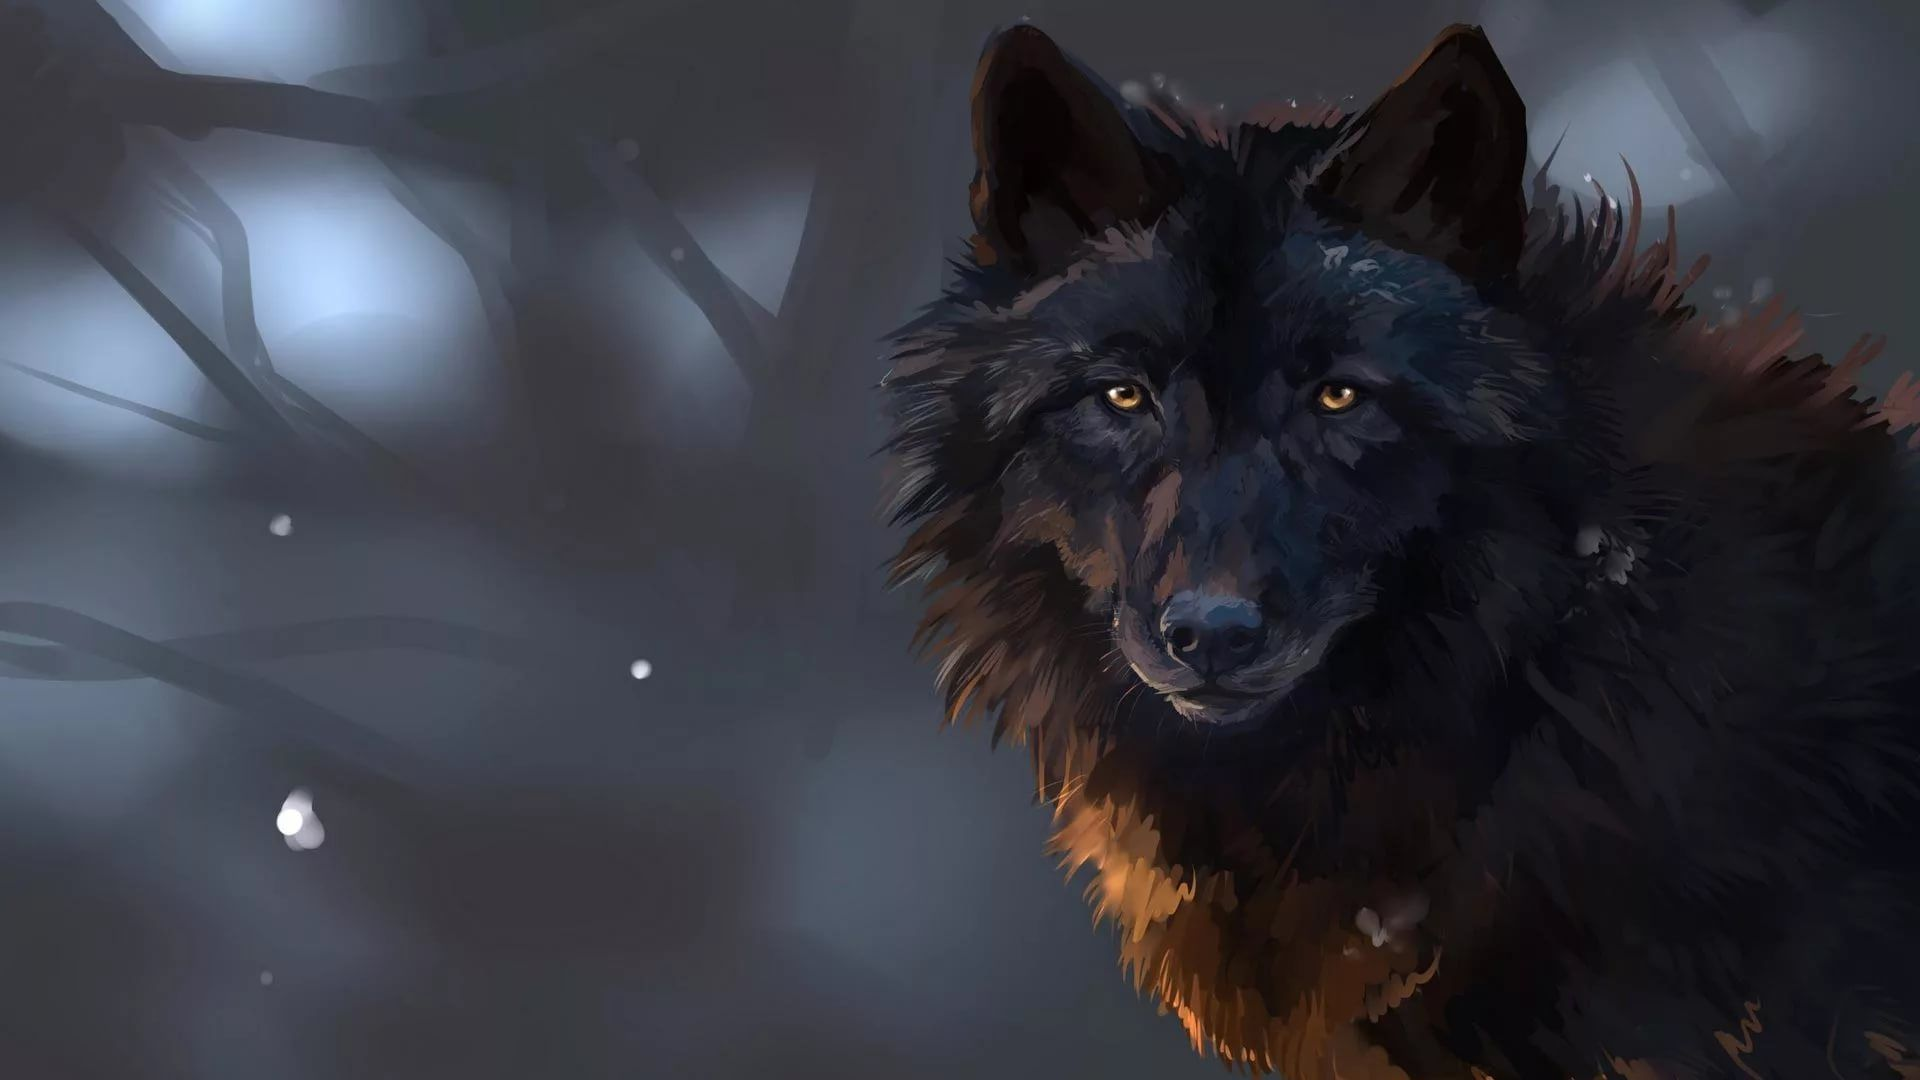 Cool Wolf wallpaper photo hd